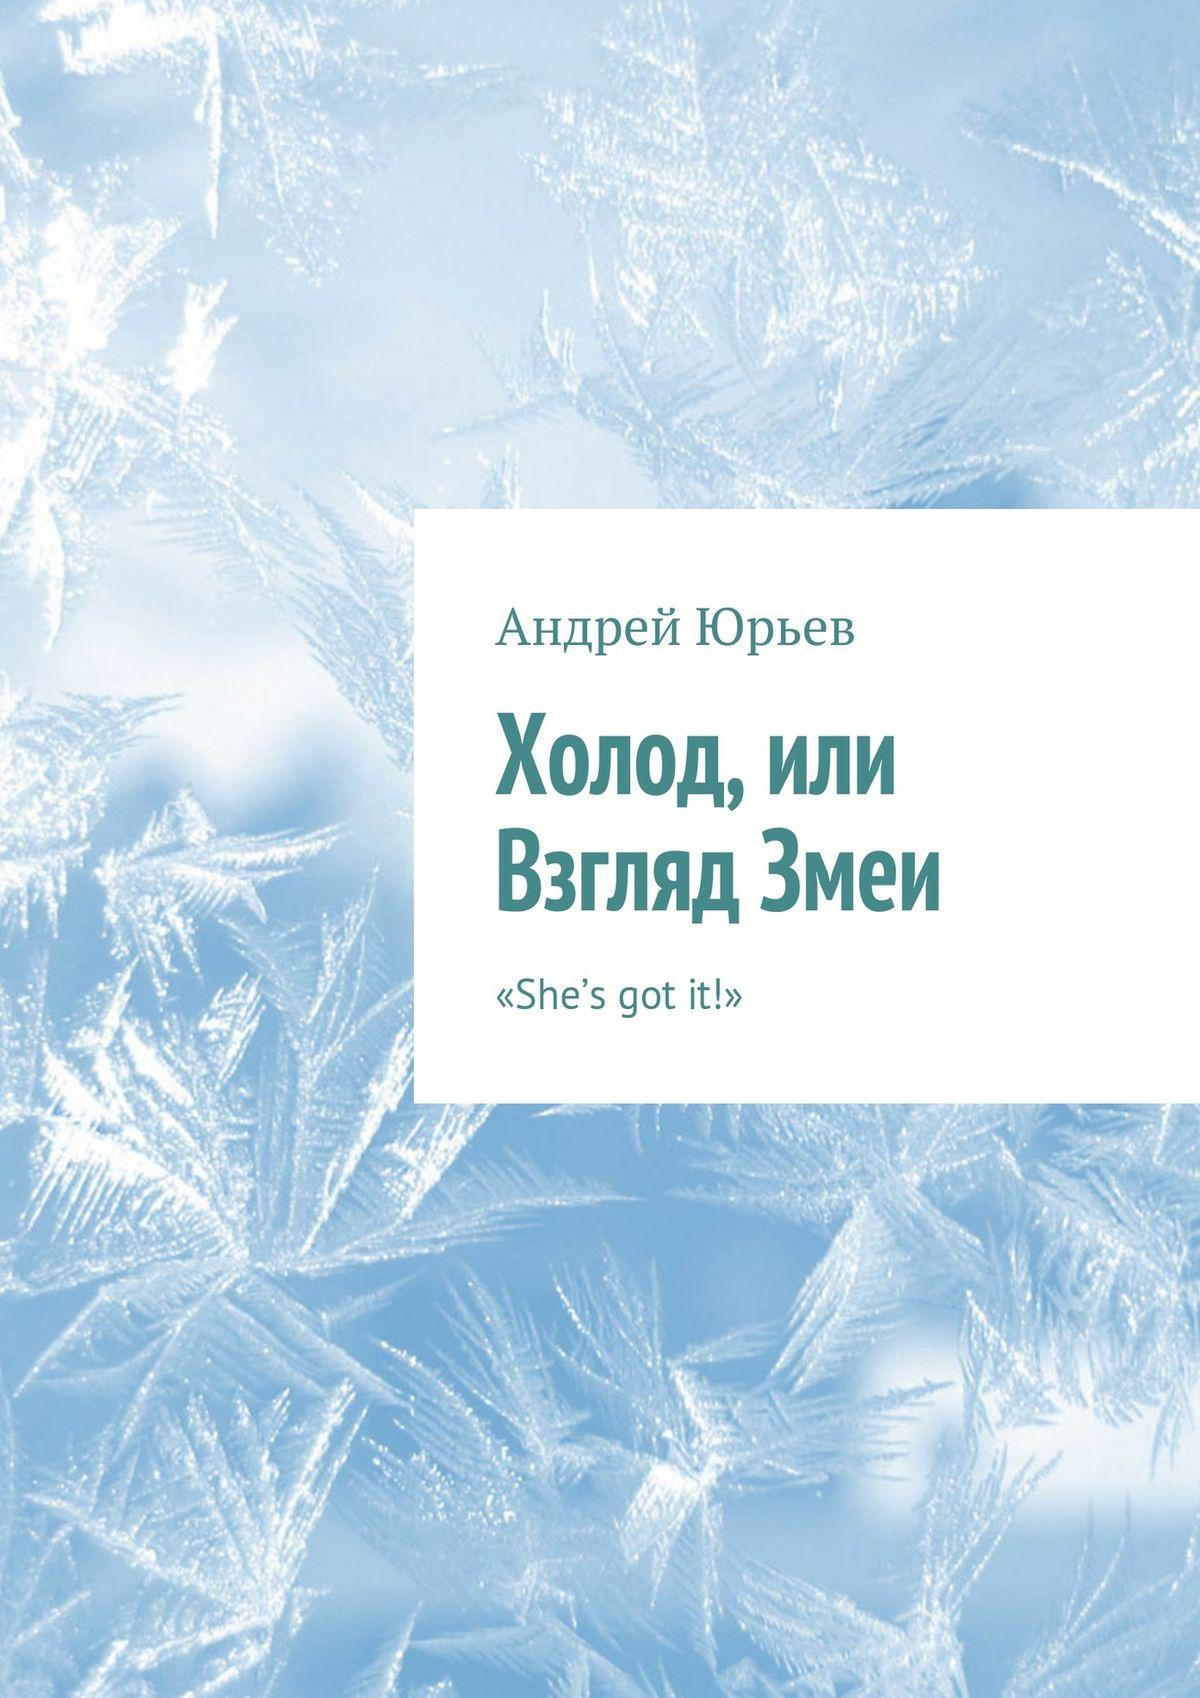 Андрей Геннадьевич Юрьев Холод, или ВзглядЗмеи